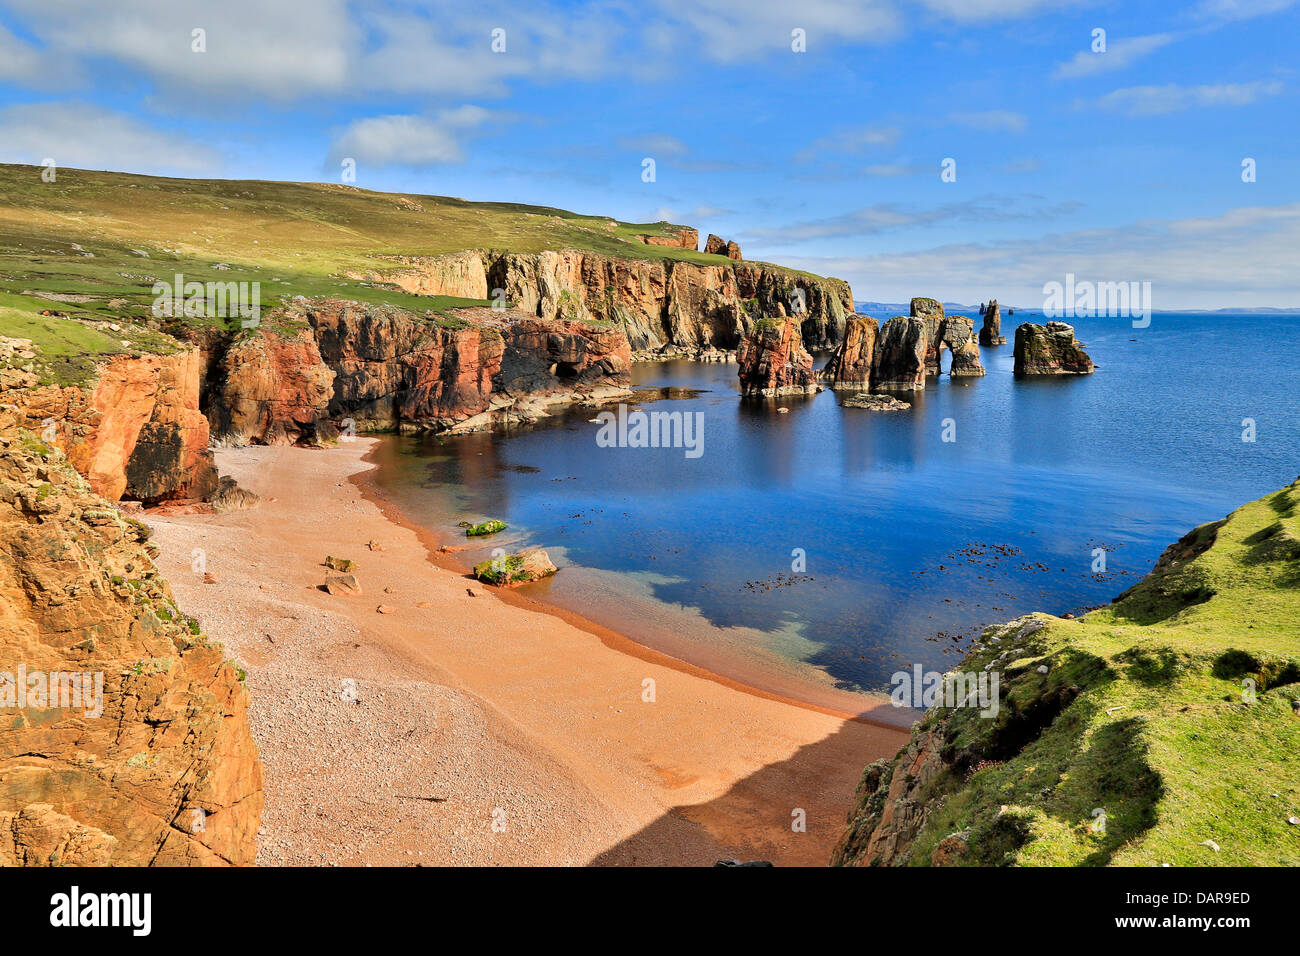 Braewick; Eshaness; Shetland; UK - Stock Image